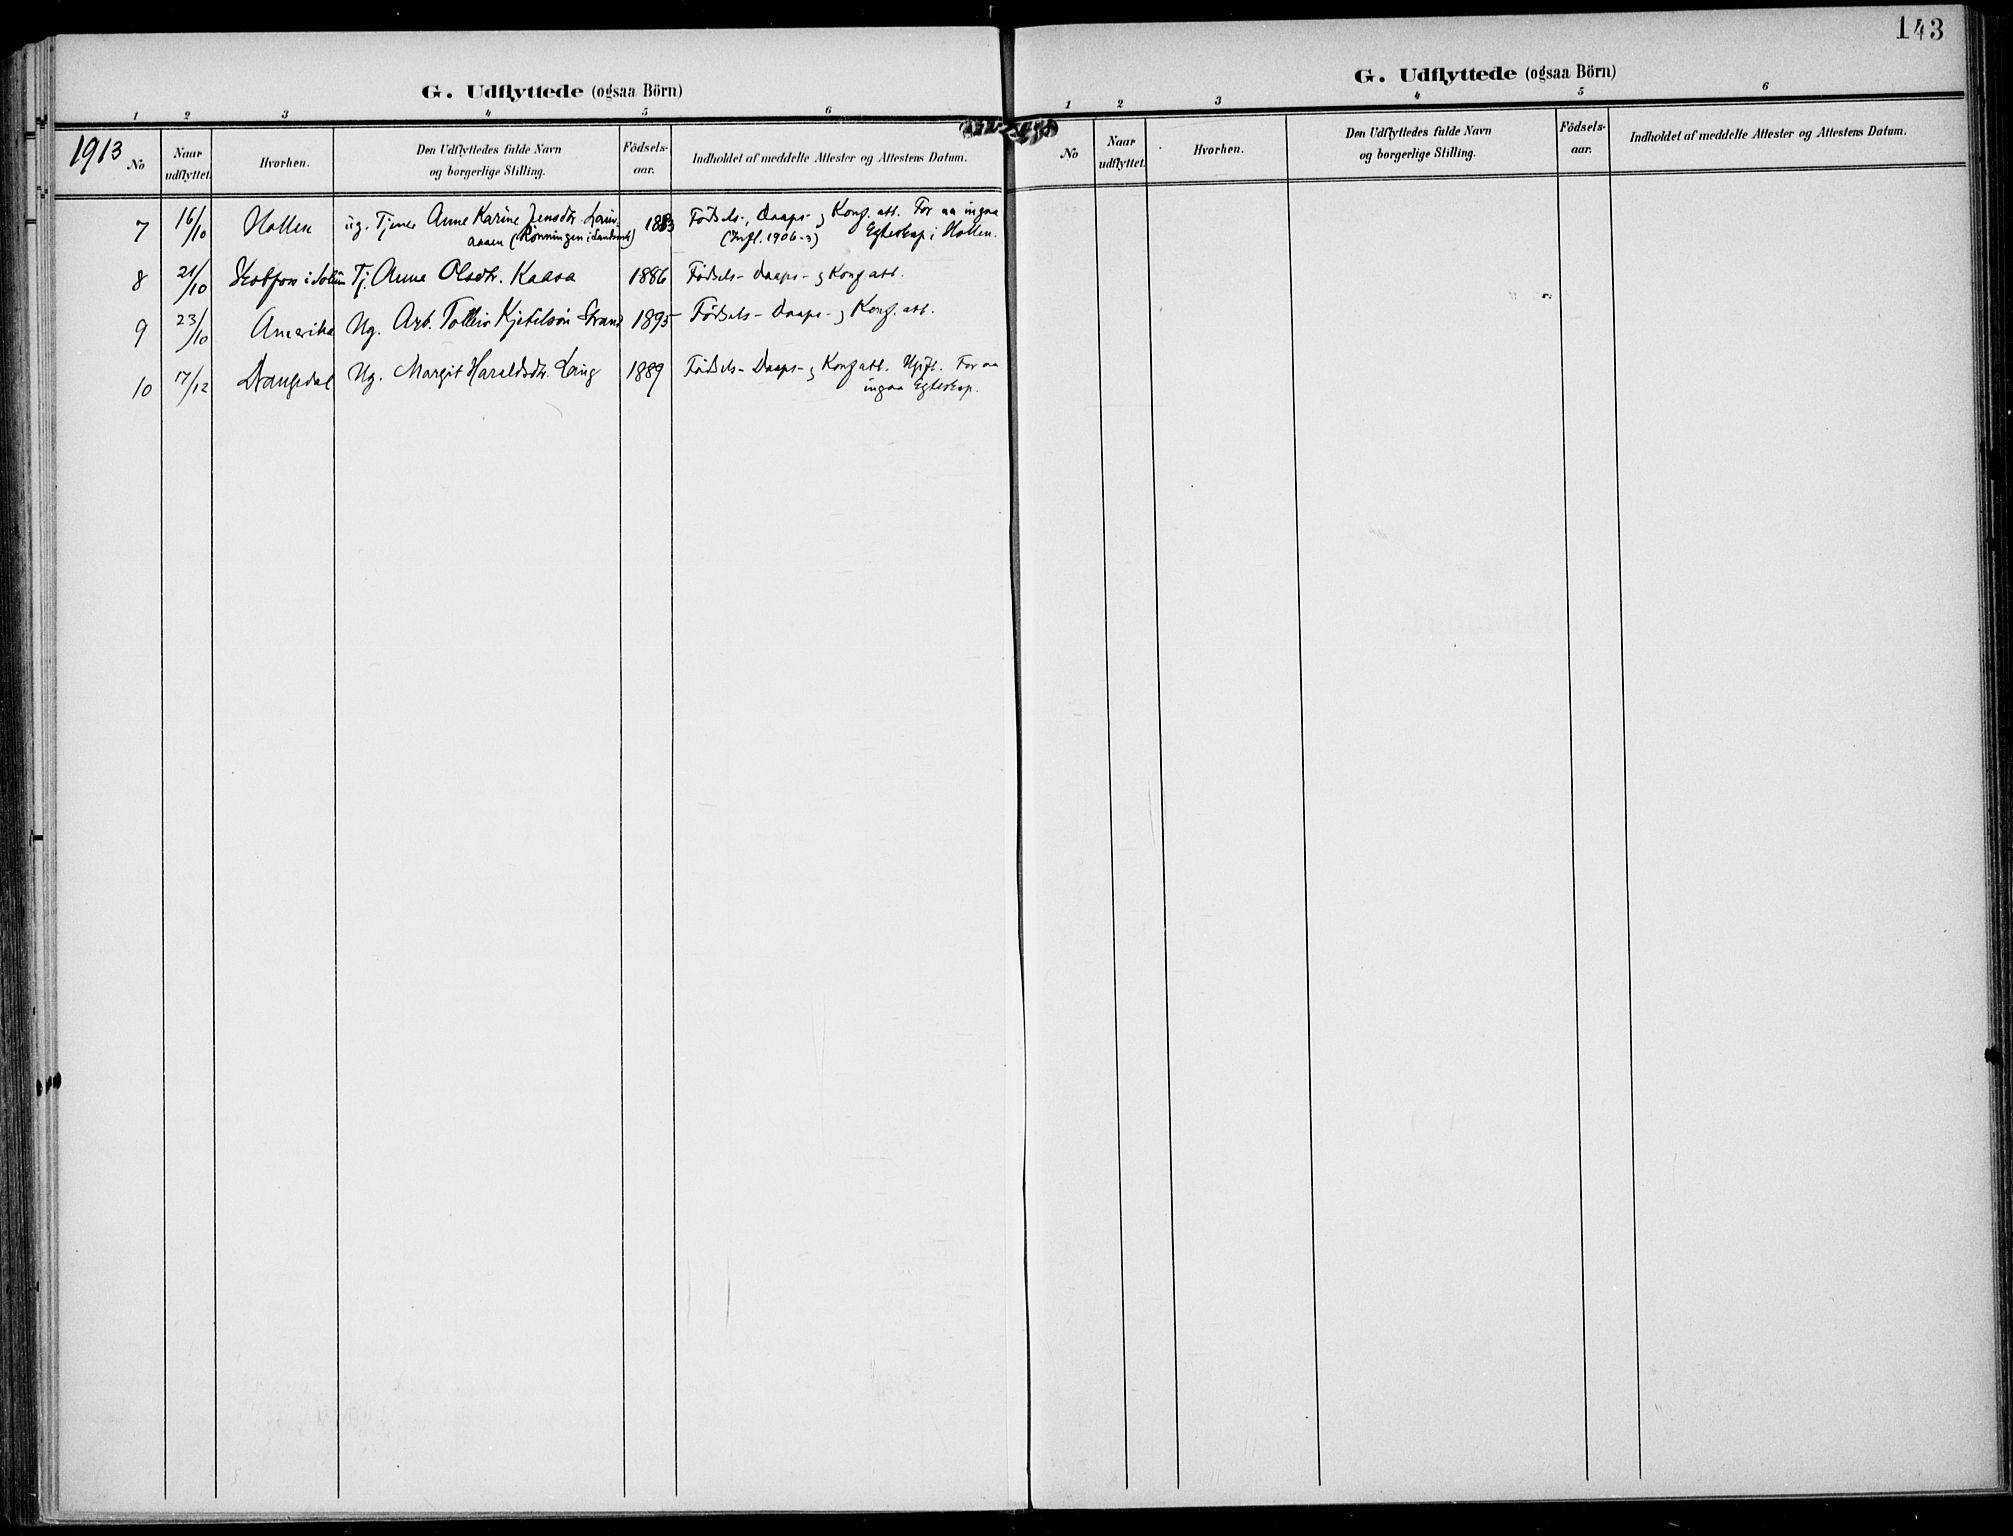 SAKO, Lunde kirkebøker, F/Fa/L0004: Ministerialbok nr. I 4, 1902-1913, s. 143